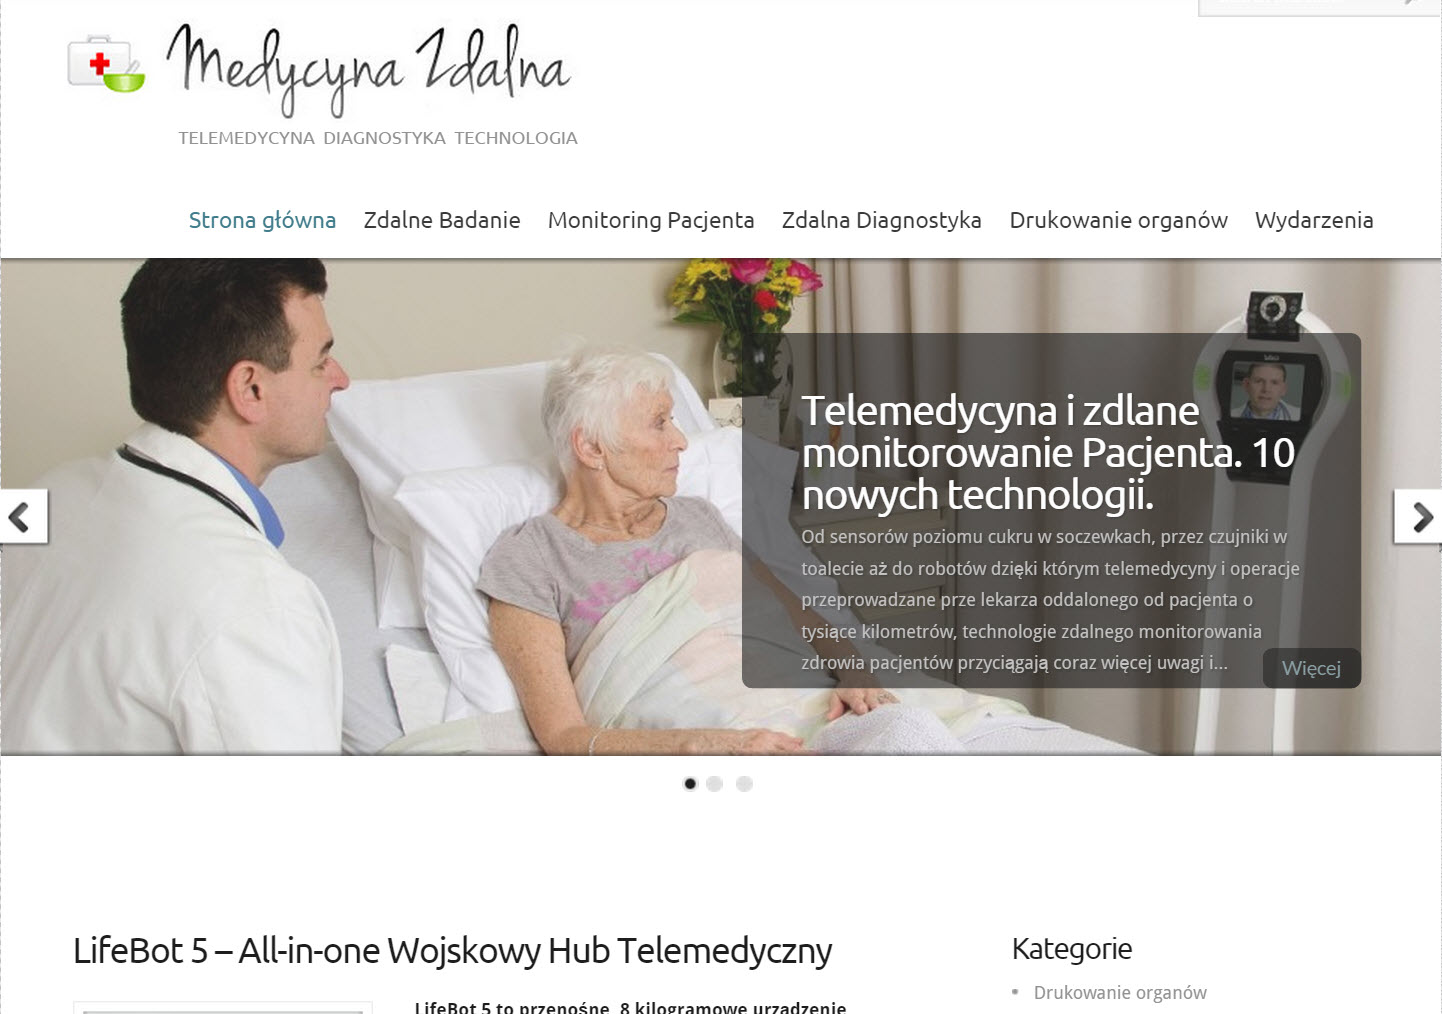 medycyna zdalna telemedycyna